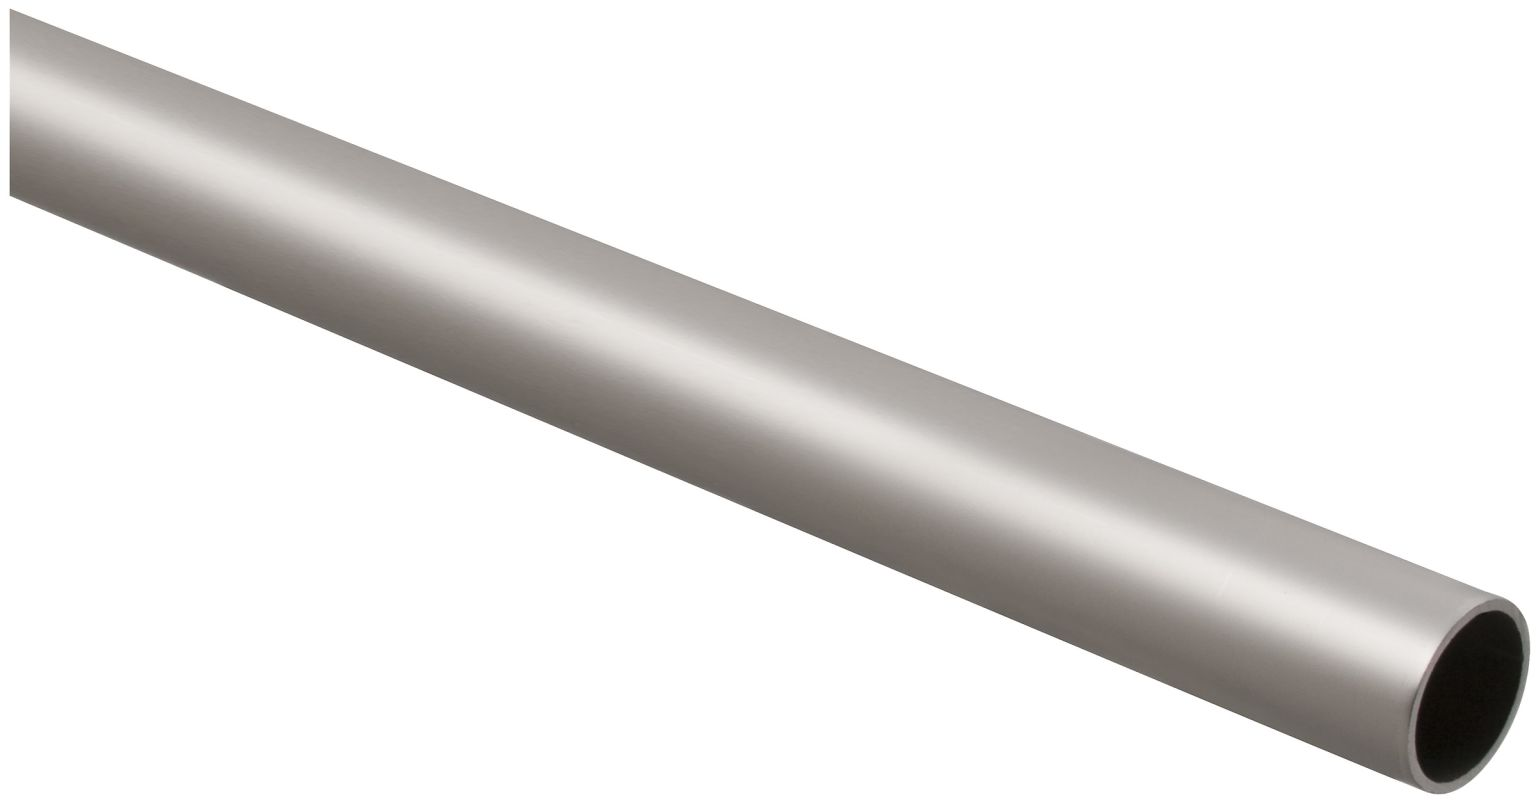 stanley home designs bb8182sn6 satin nickel 6 foot long closet rod